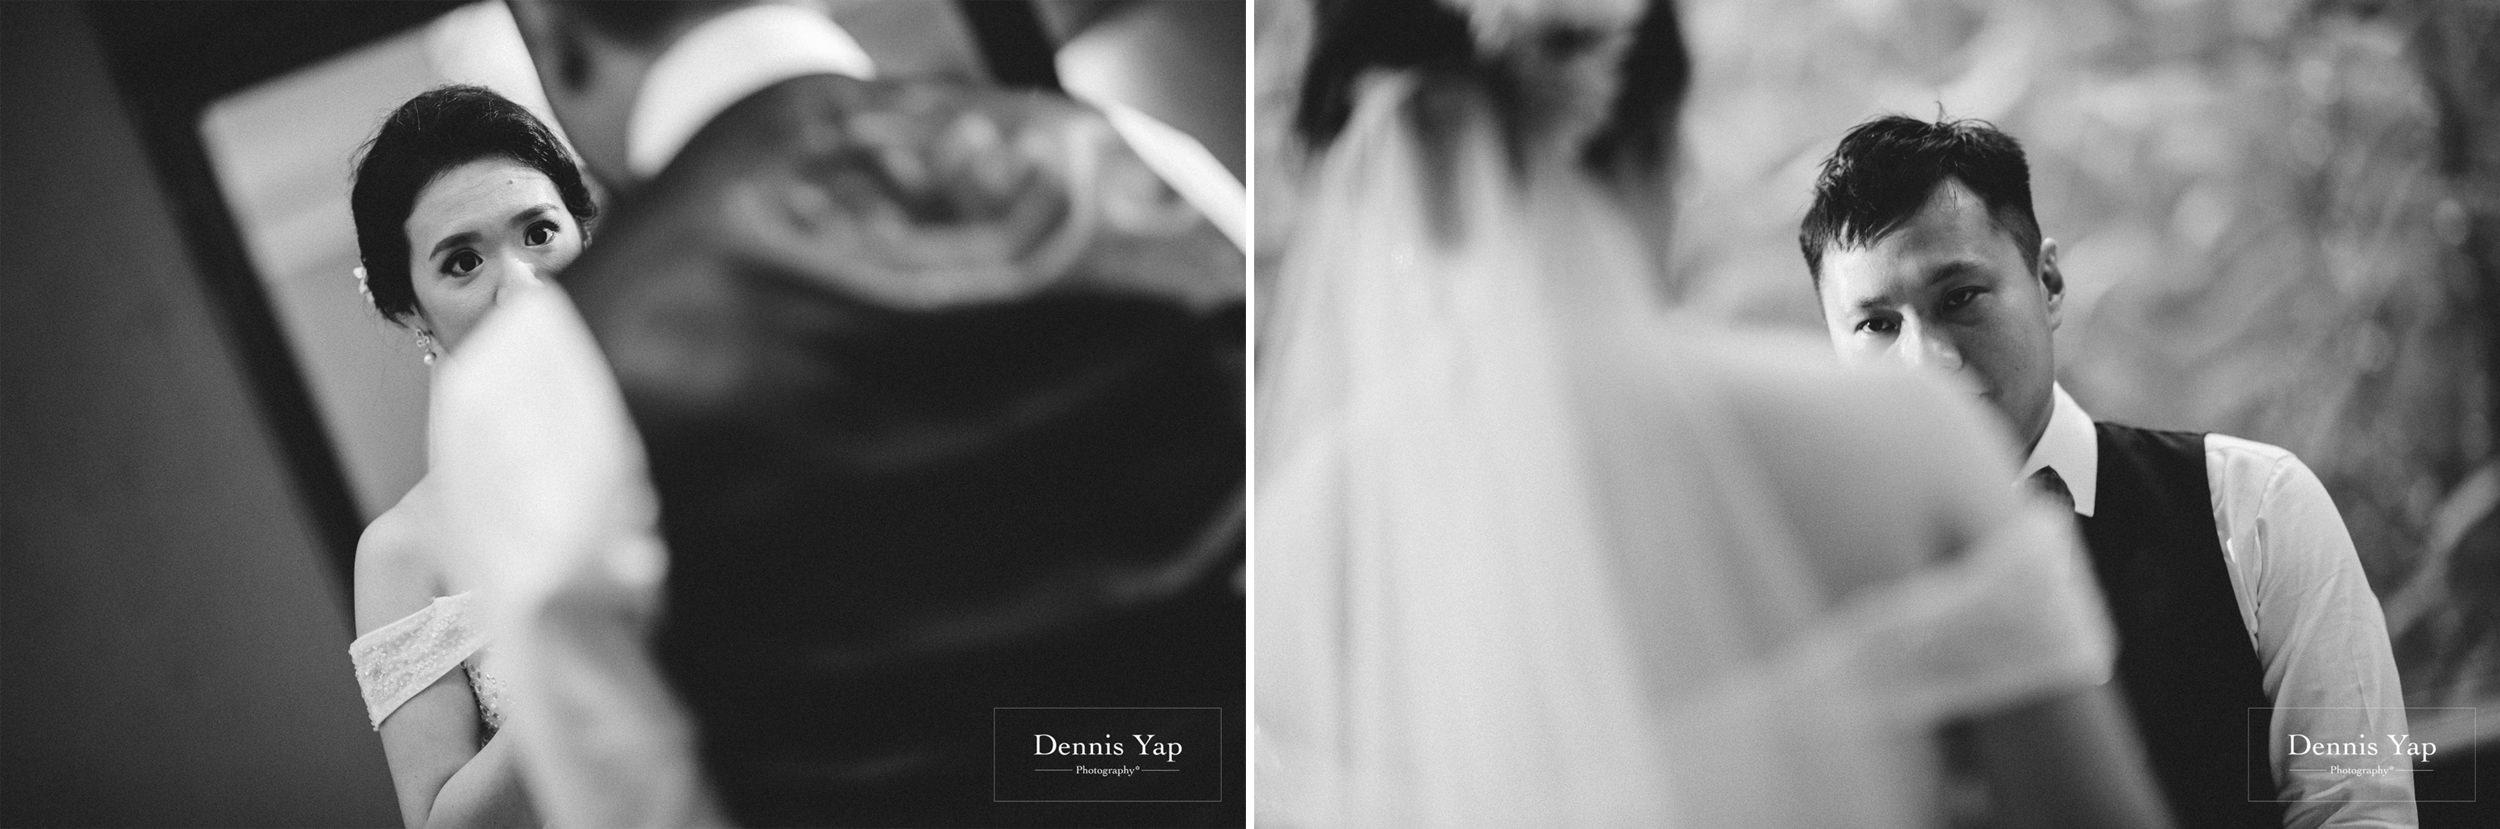 vincent peggy wedding dinner neo tamarind kuala lumpur dennis yap photography-22.jpg